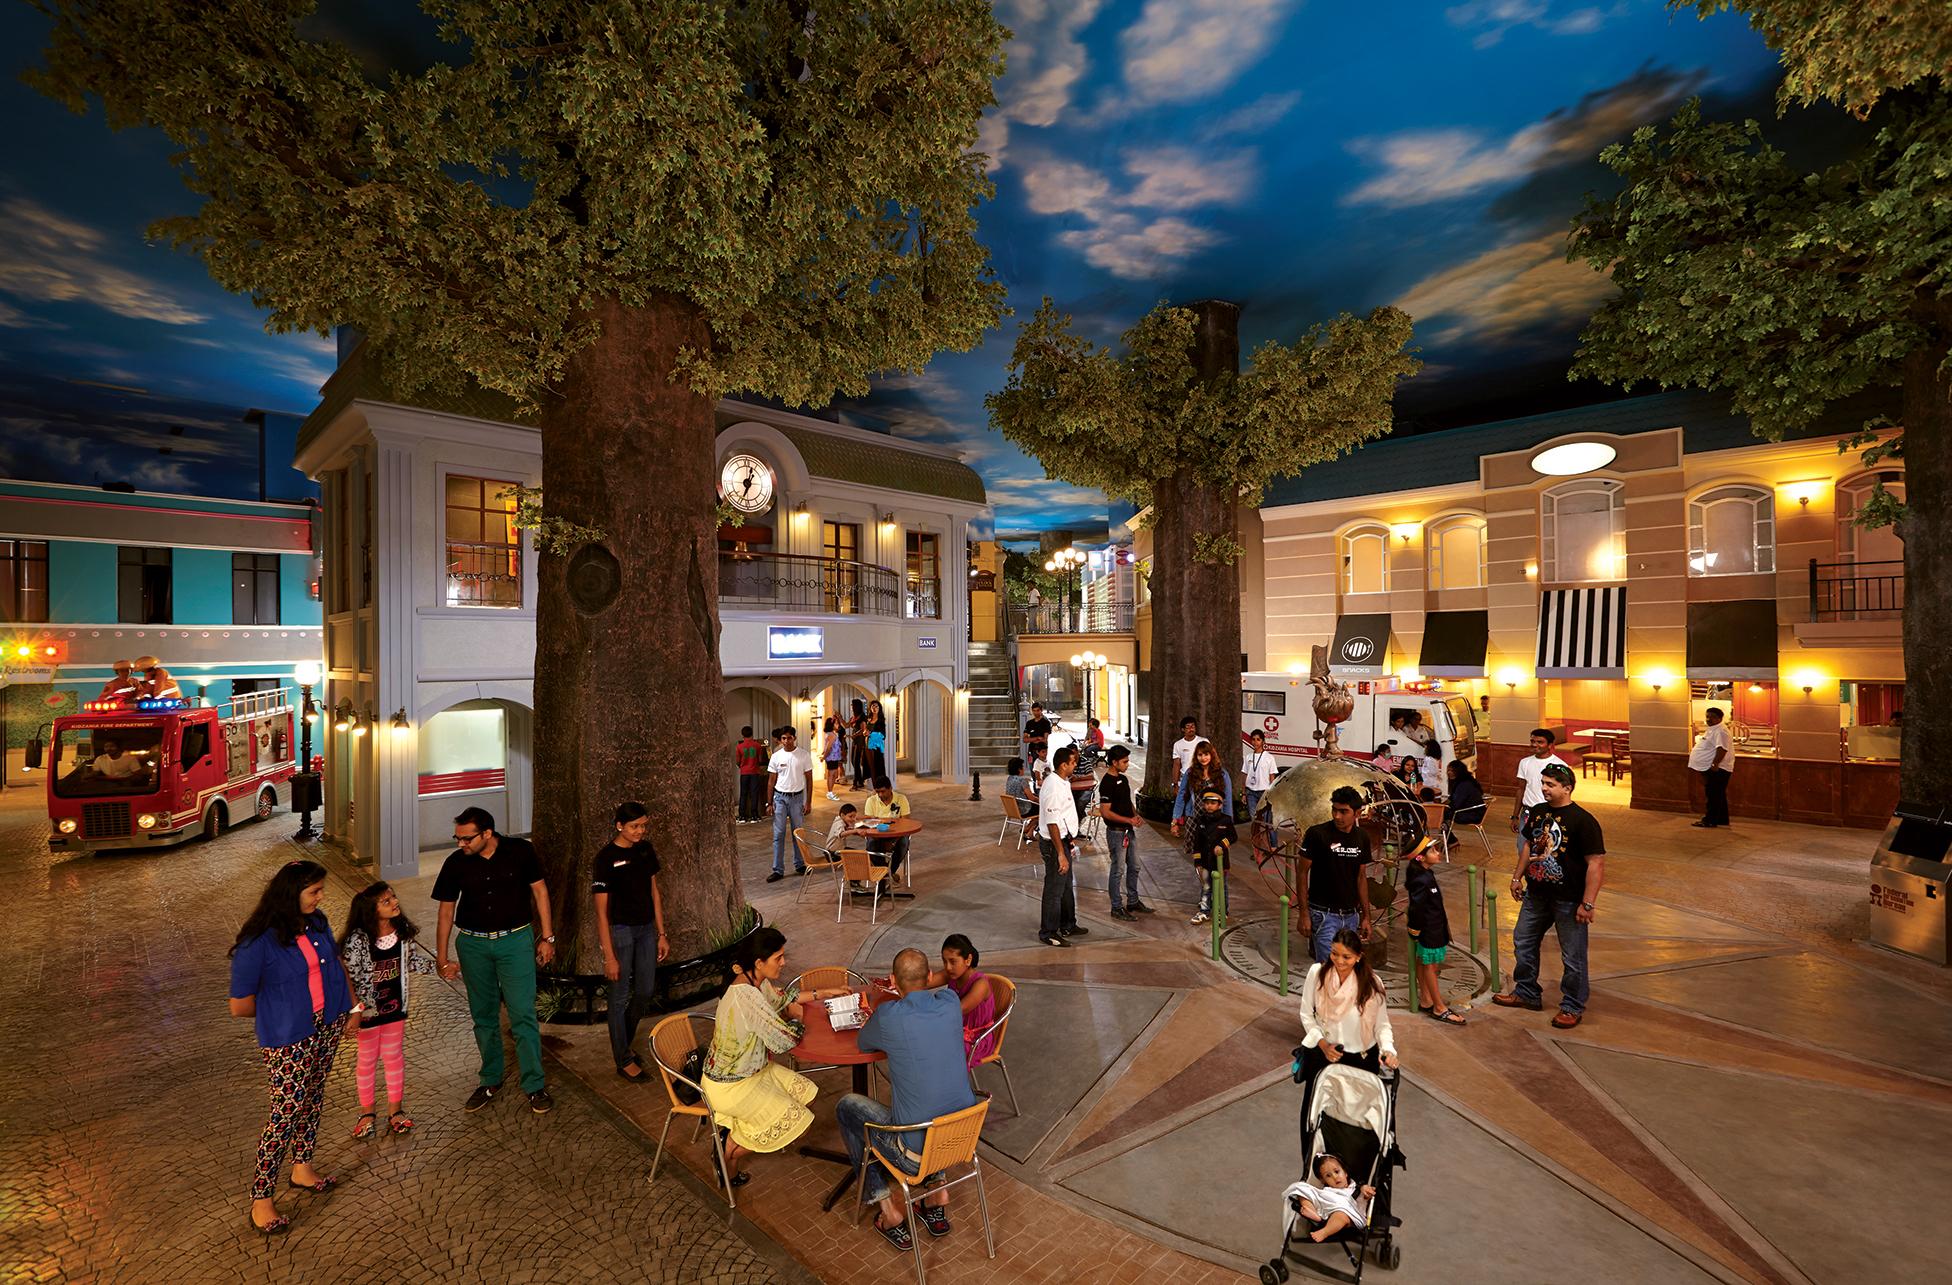 Bkk forex pte ltd city plaza